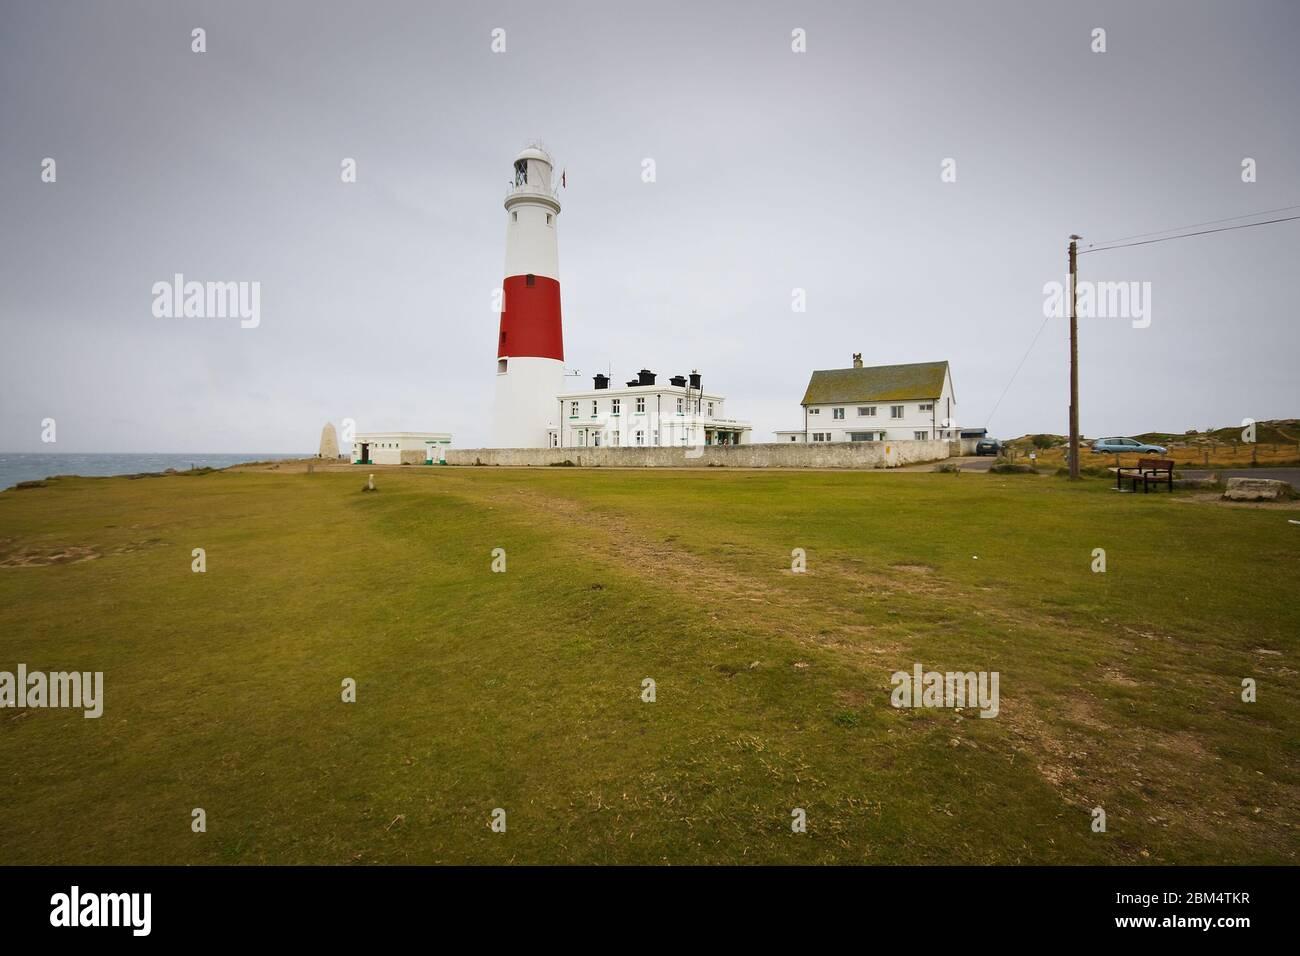 Portland Bill lighthouse dans le Dorset, UK. Banque D'Images